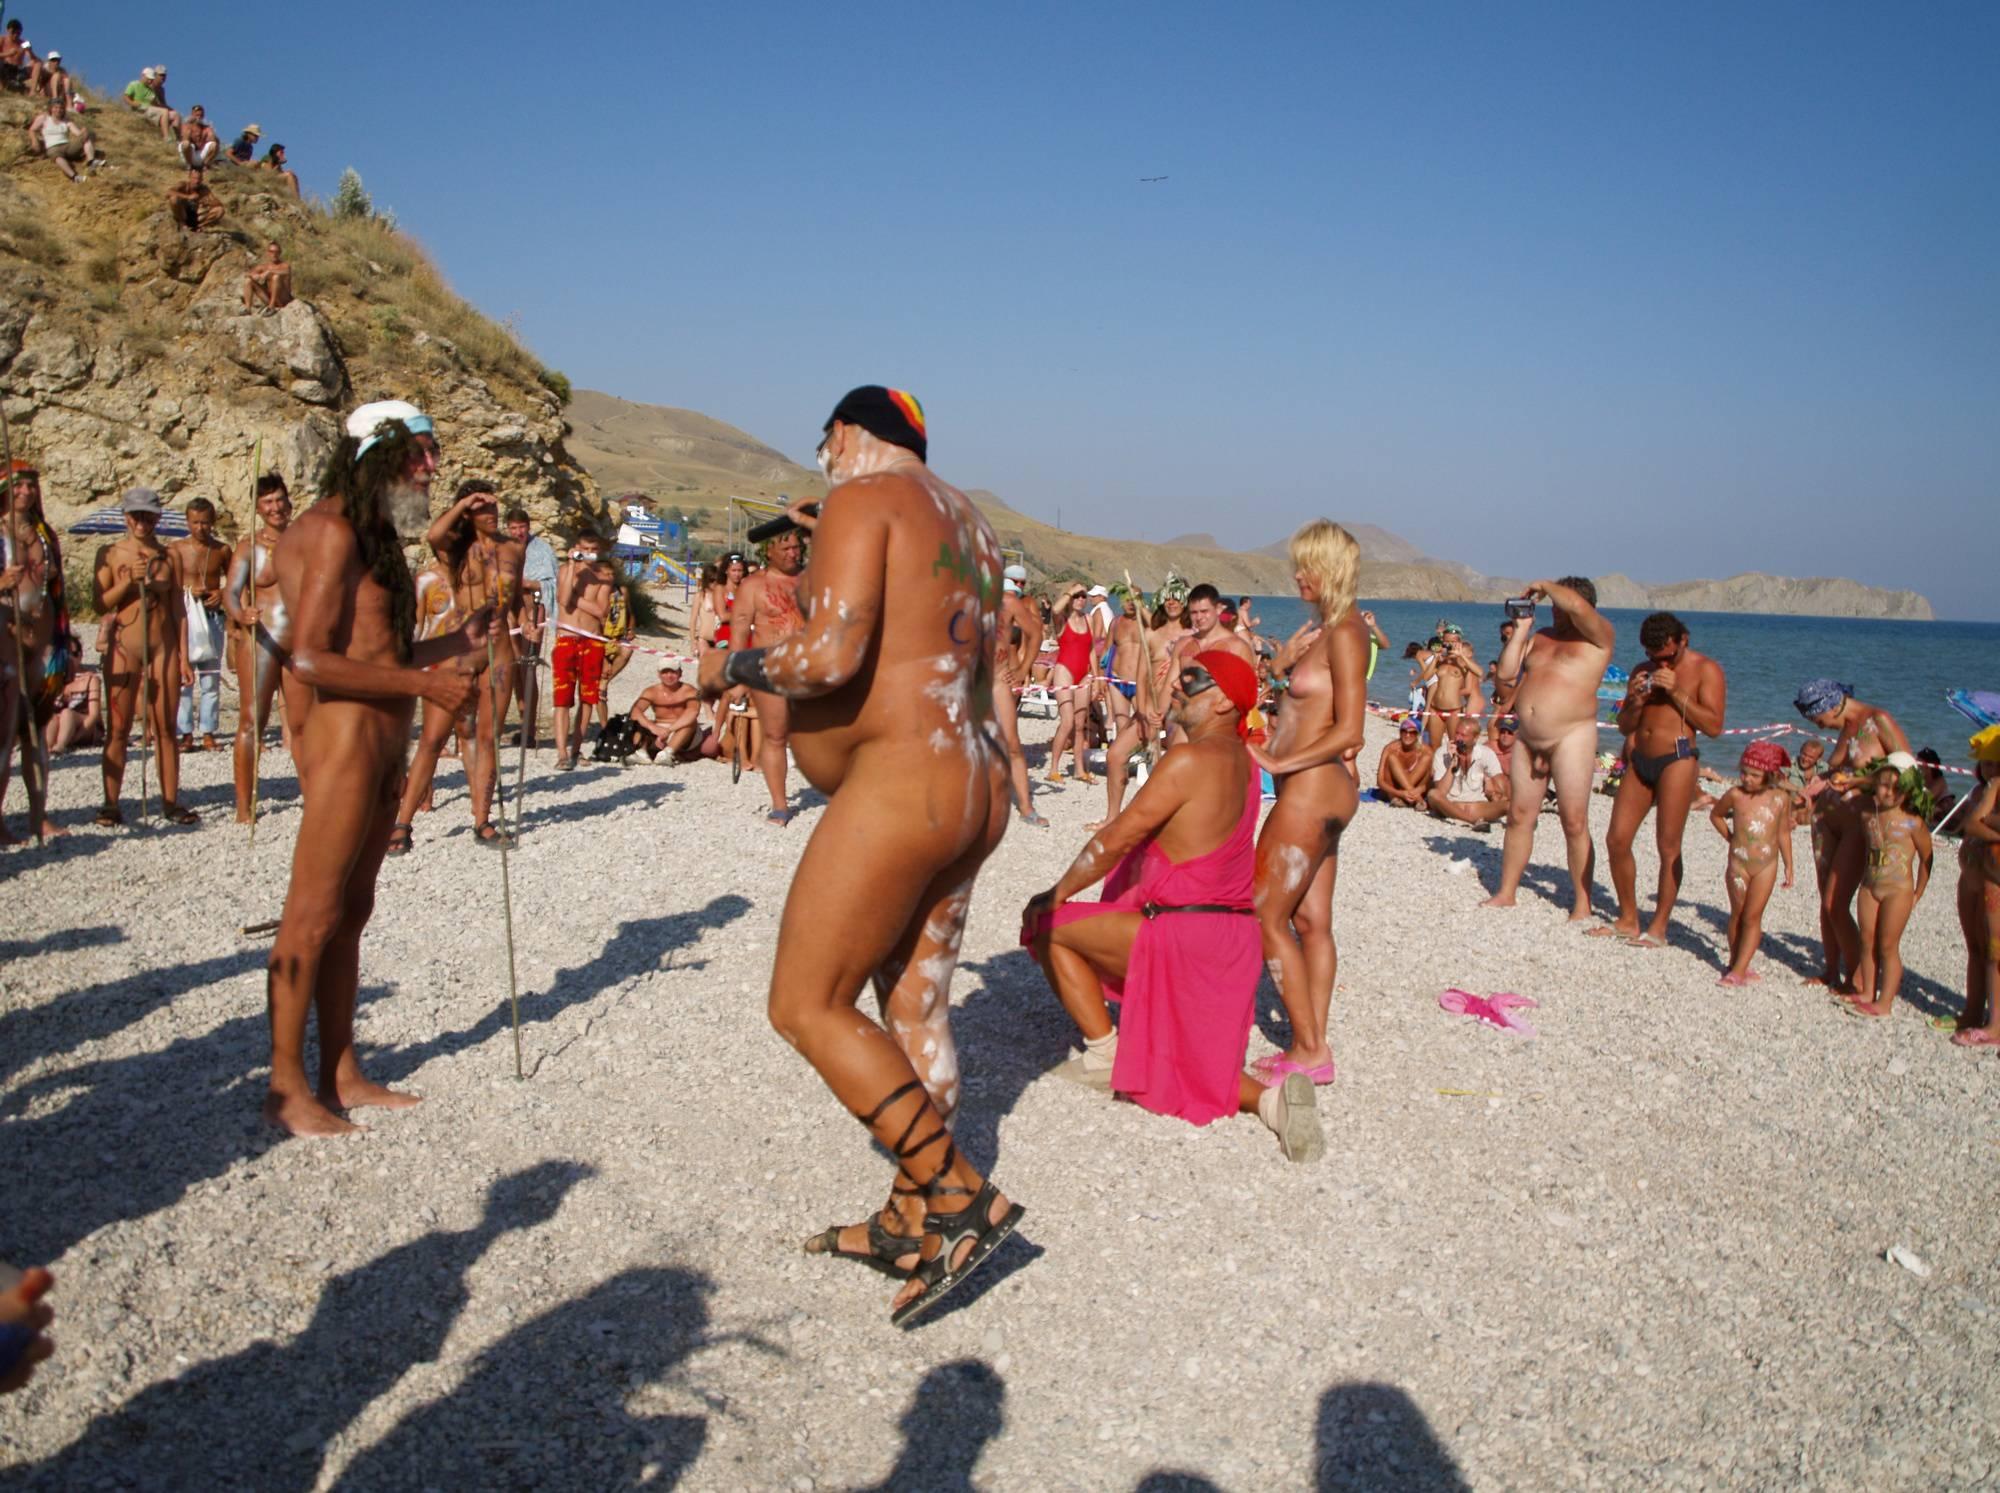 Nudist Pics Nudist Event Introductions - 1